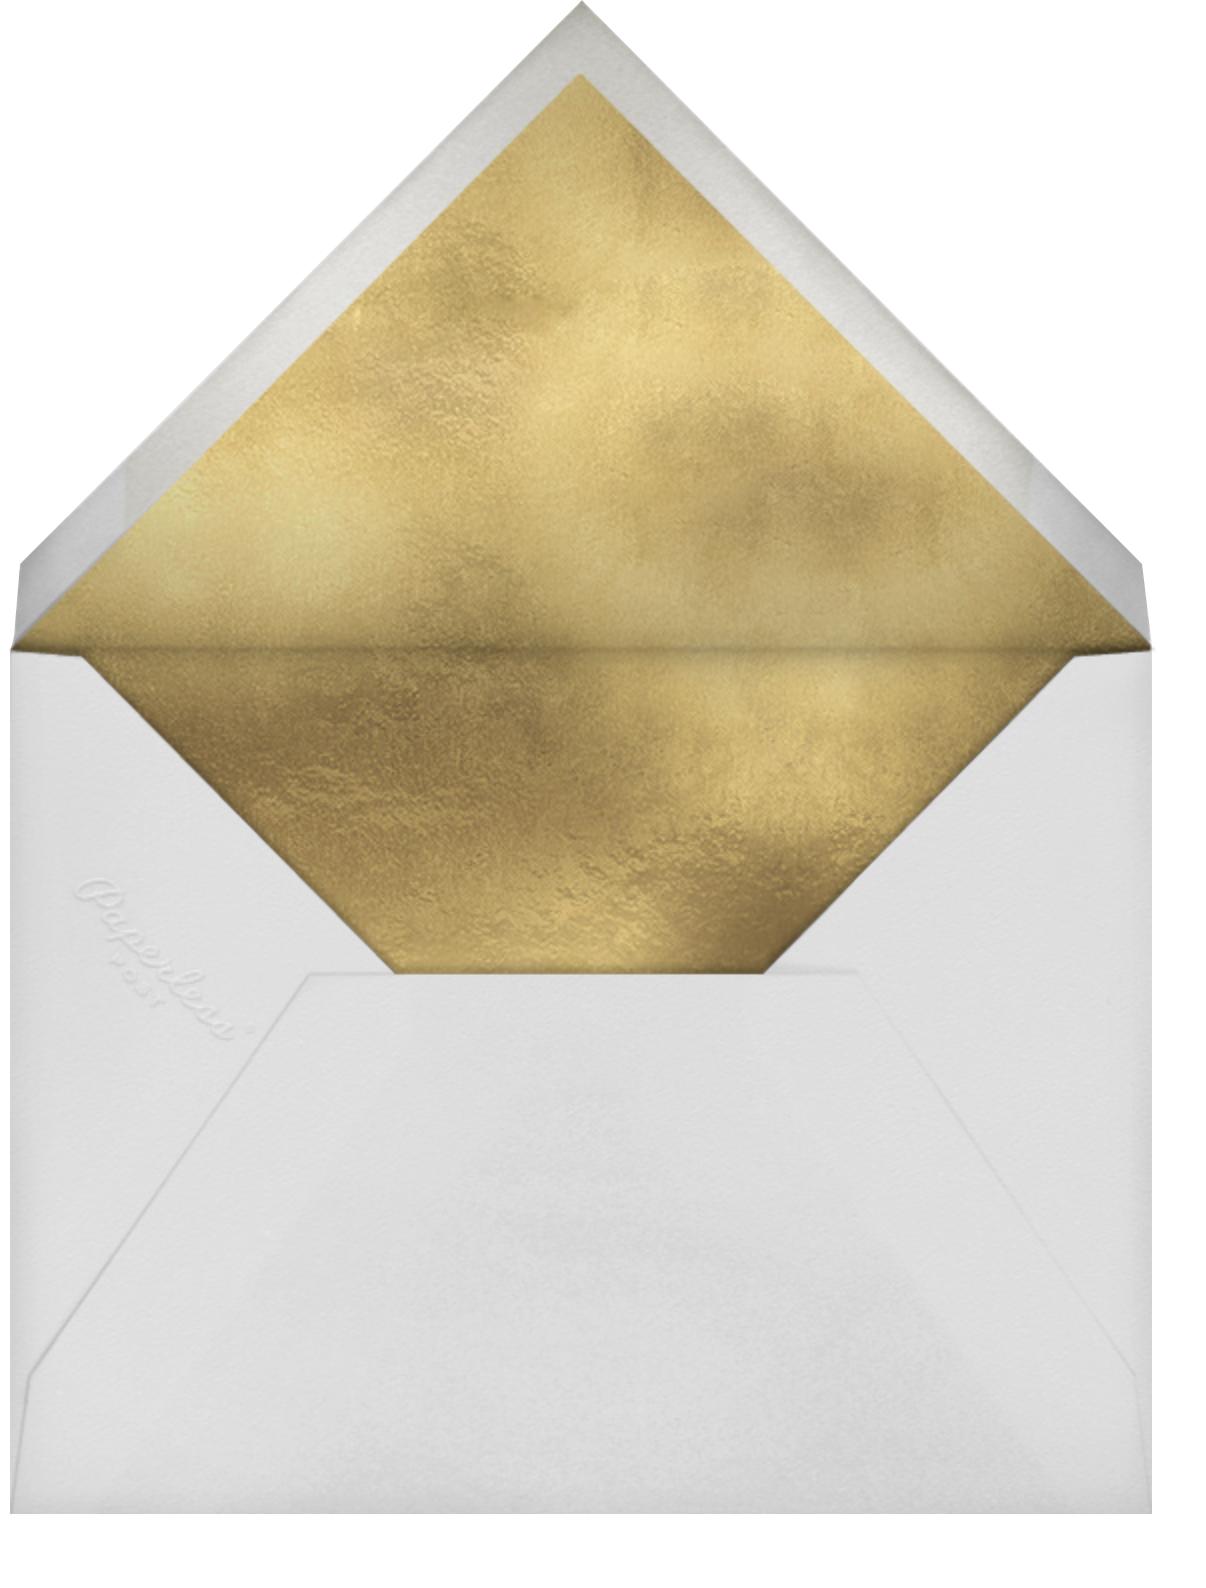 Walker (Invitation) - Lilac - Paperless Post - All - envelope back